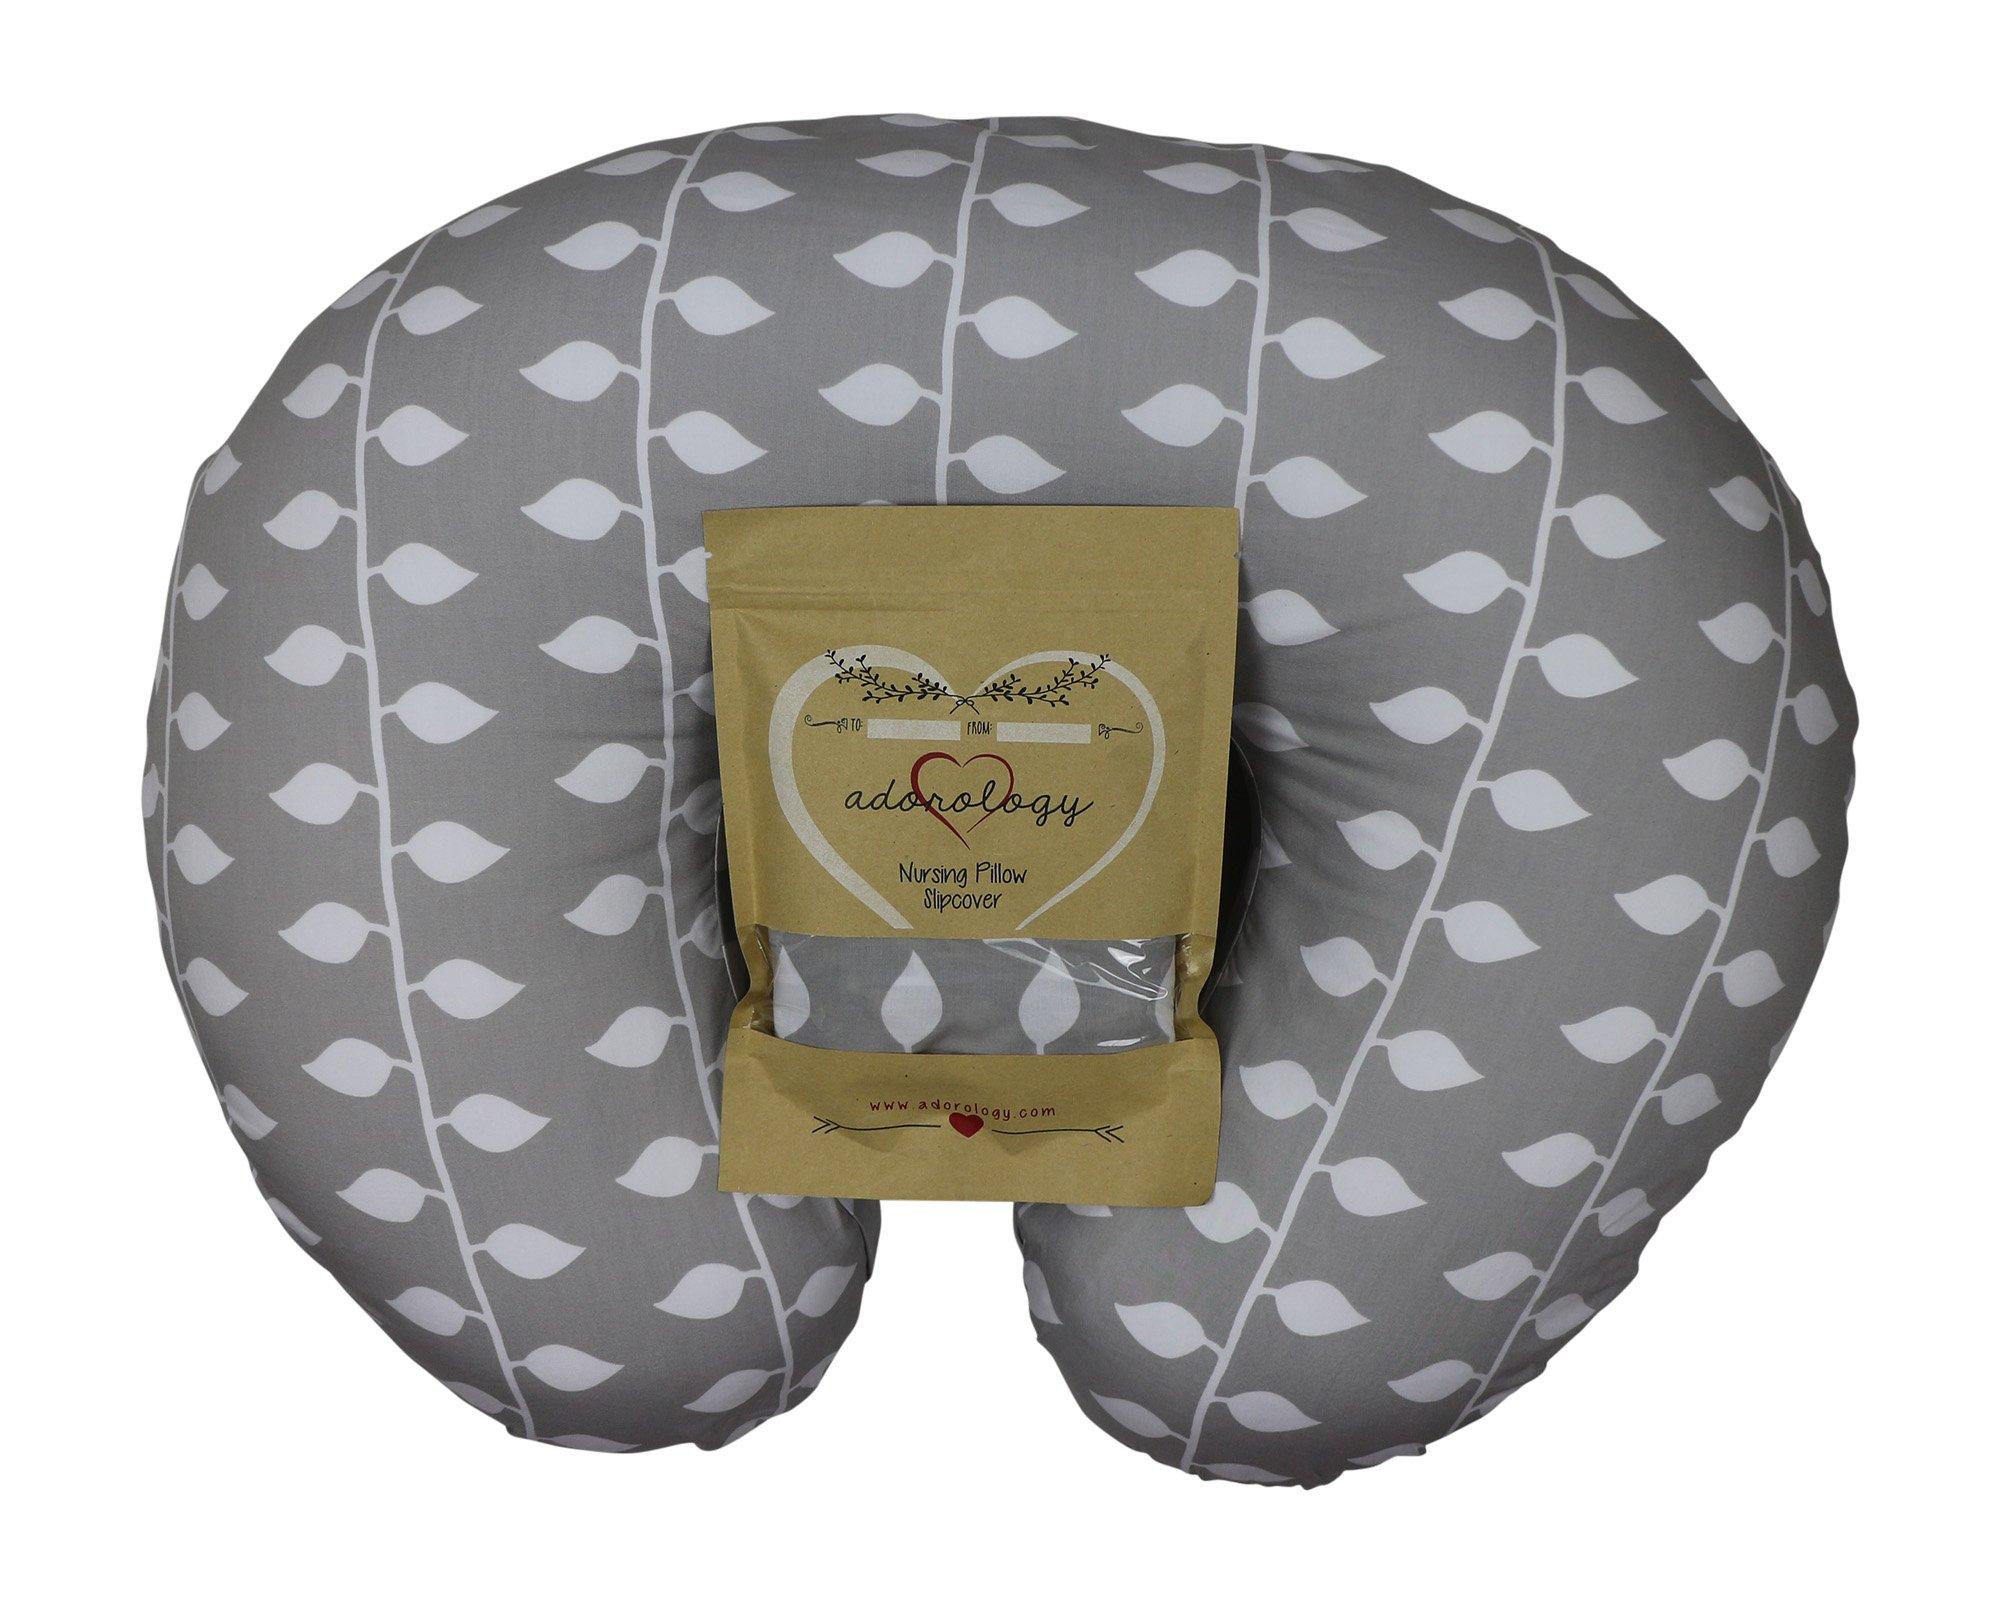 Organic Nursing Pillow Slipcover Gray Ivy Design Maternity Breastfeeding Newborn Infant Feeding Cushion Cover Case Baby Shower Gift for New Moms by Adorology